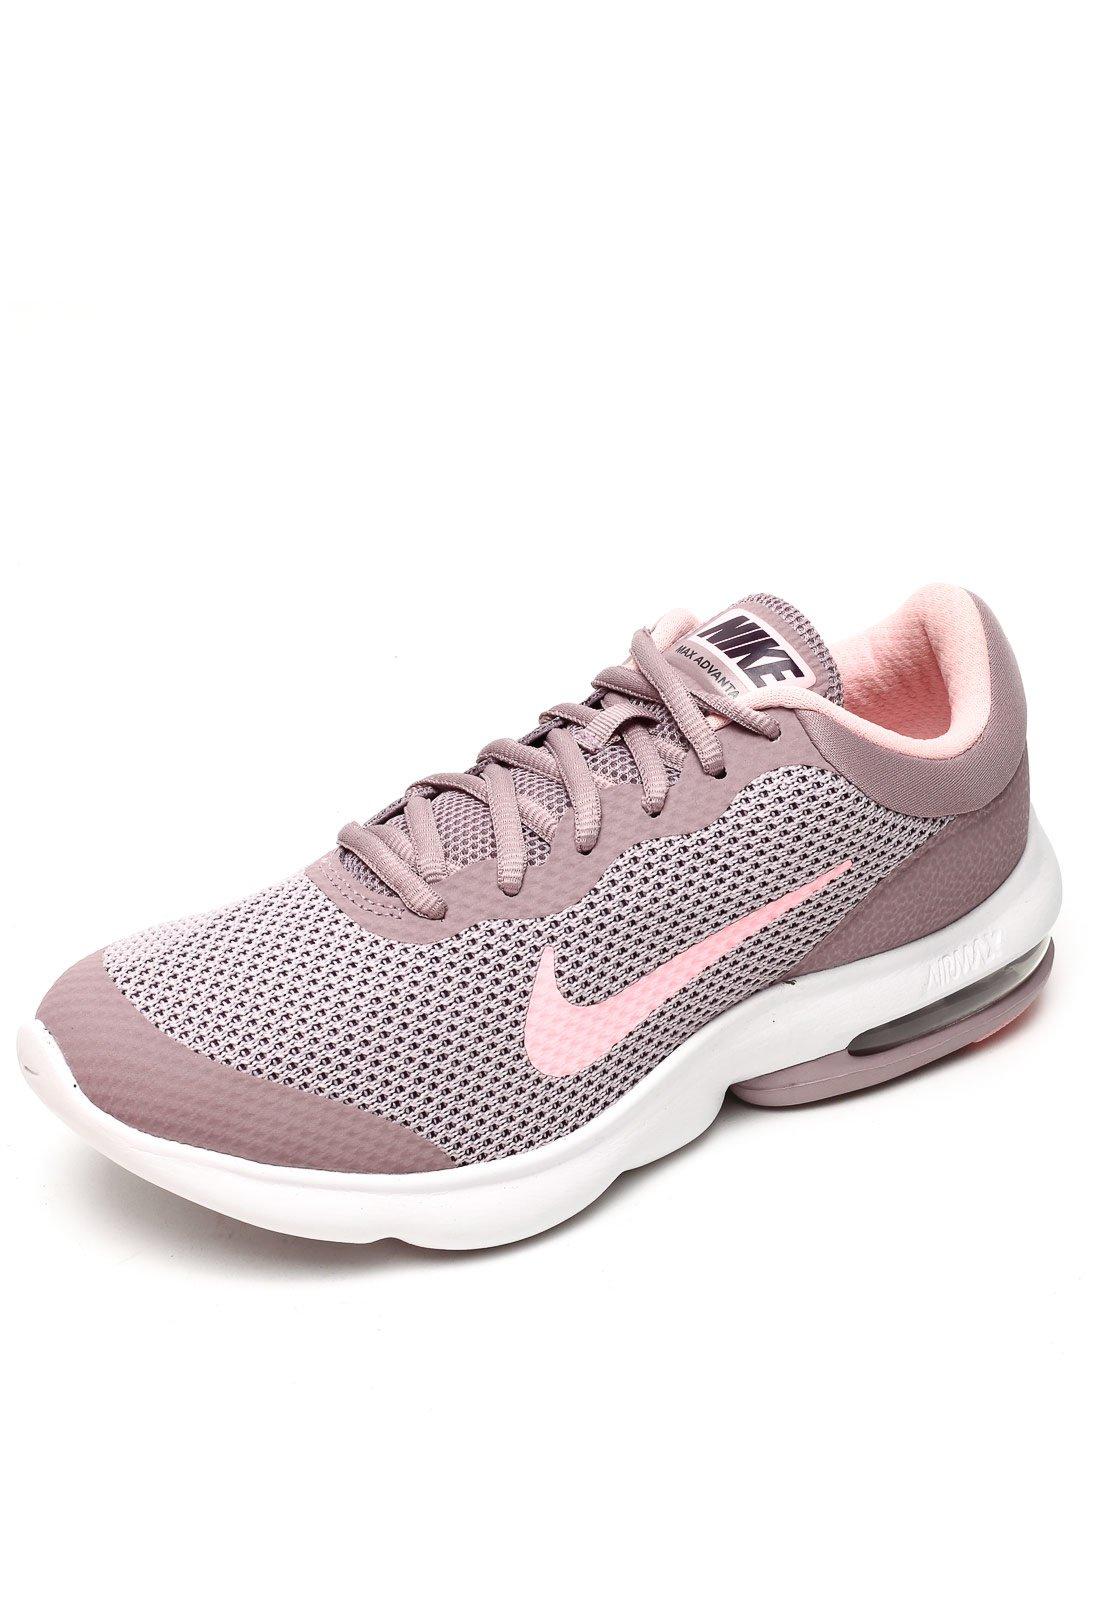 nike air max feminino branco com rosa cinza